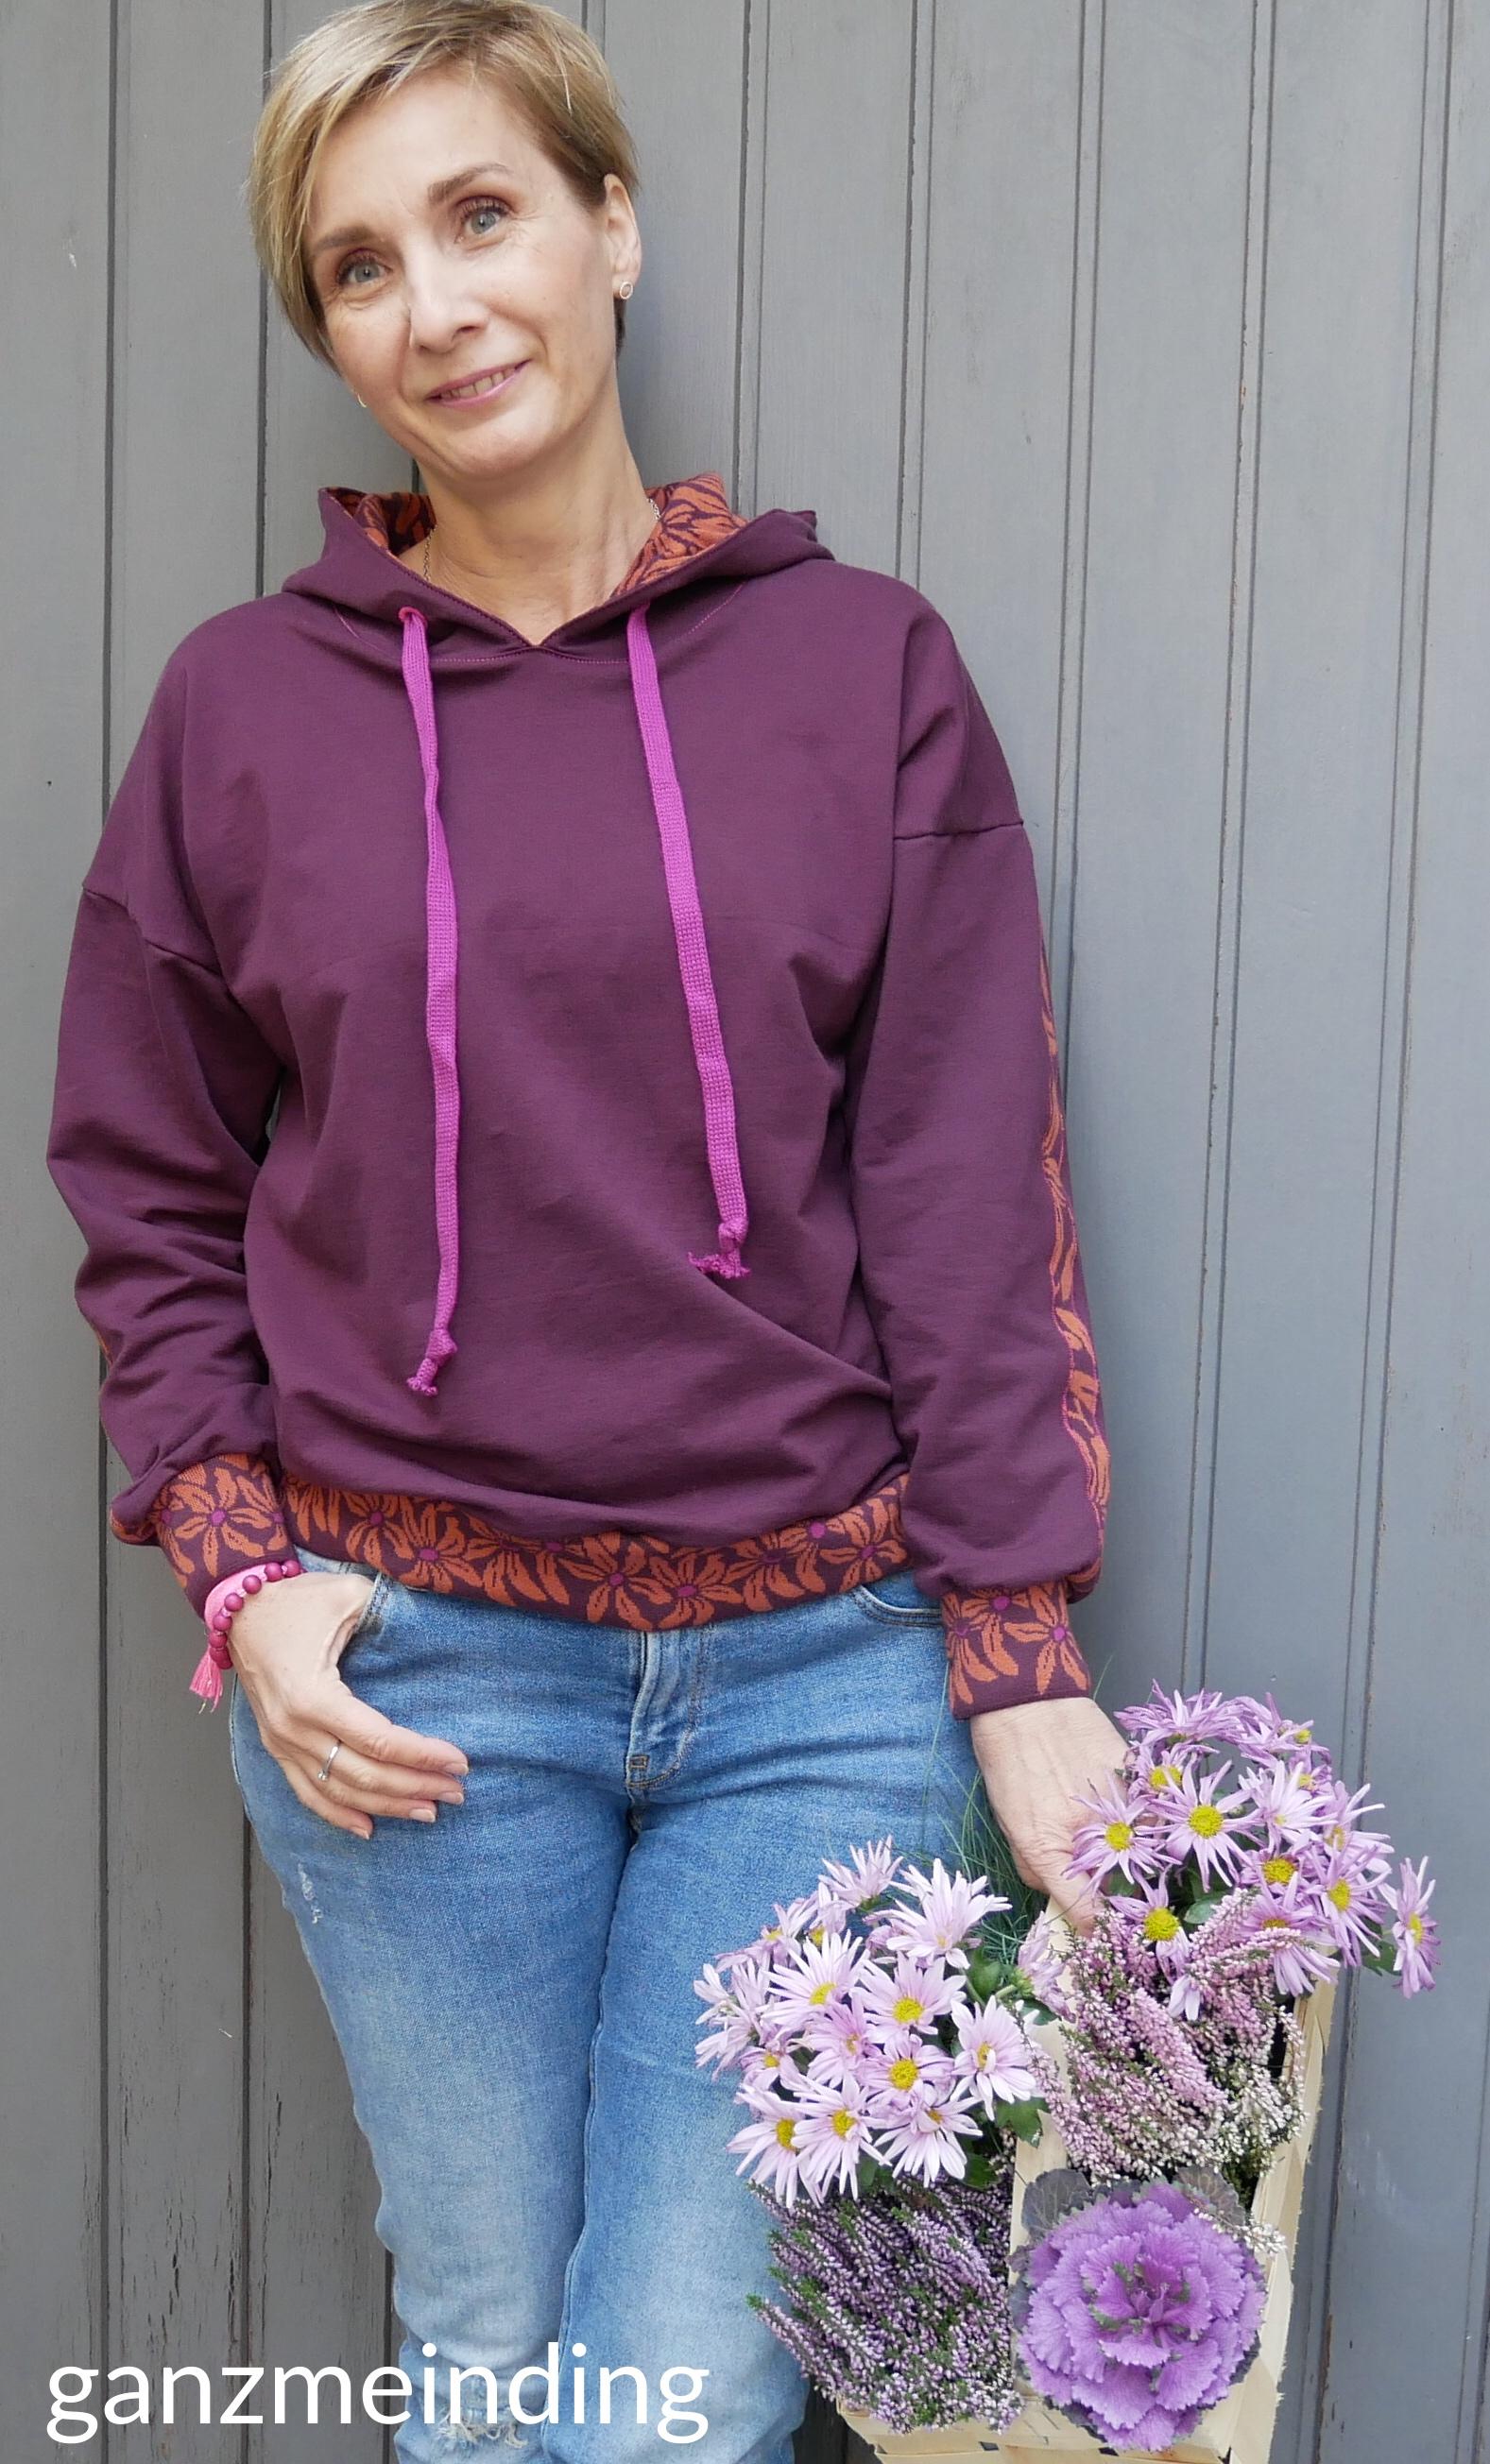 ganzmeinding: Flur Hello Heidi Fabrics, Hoodie 01 die Komplizin 03